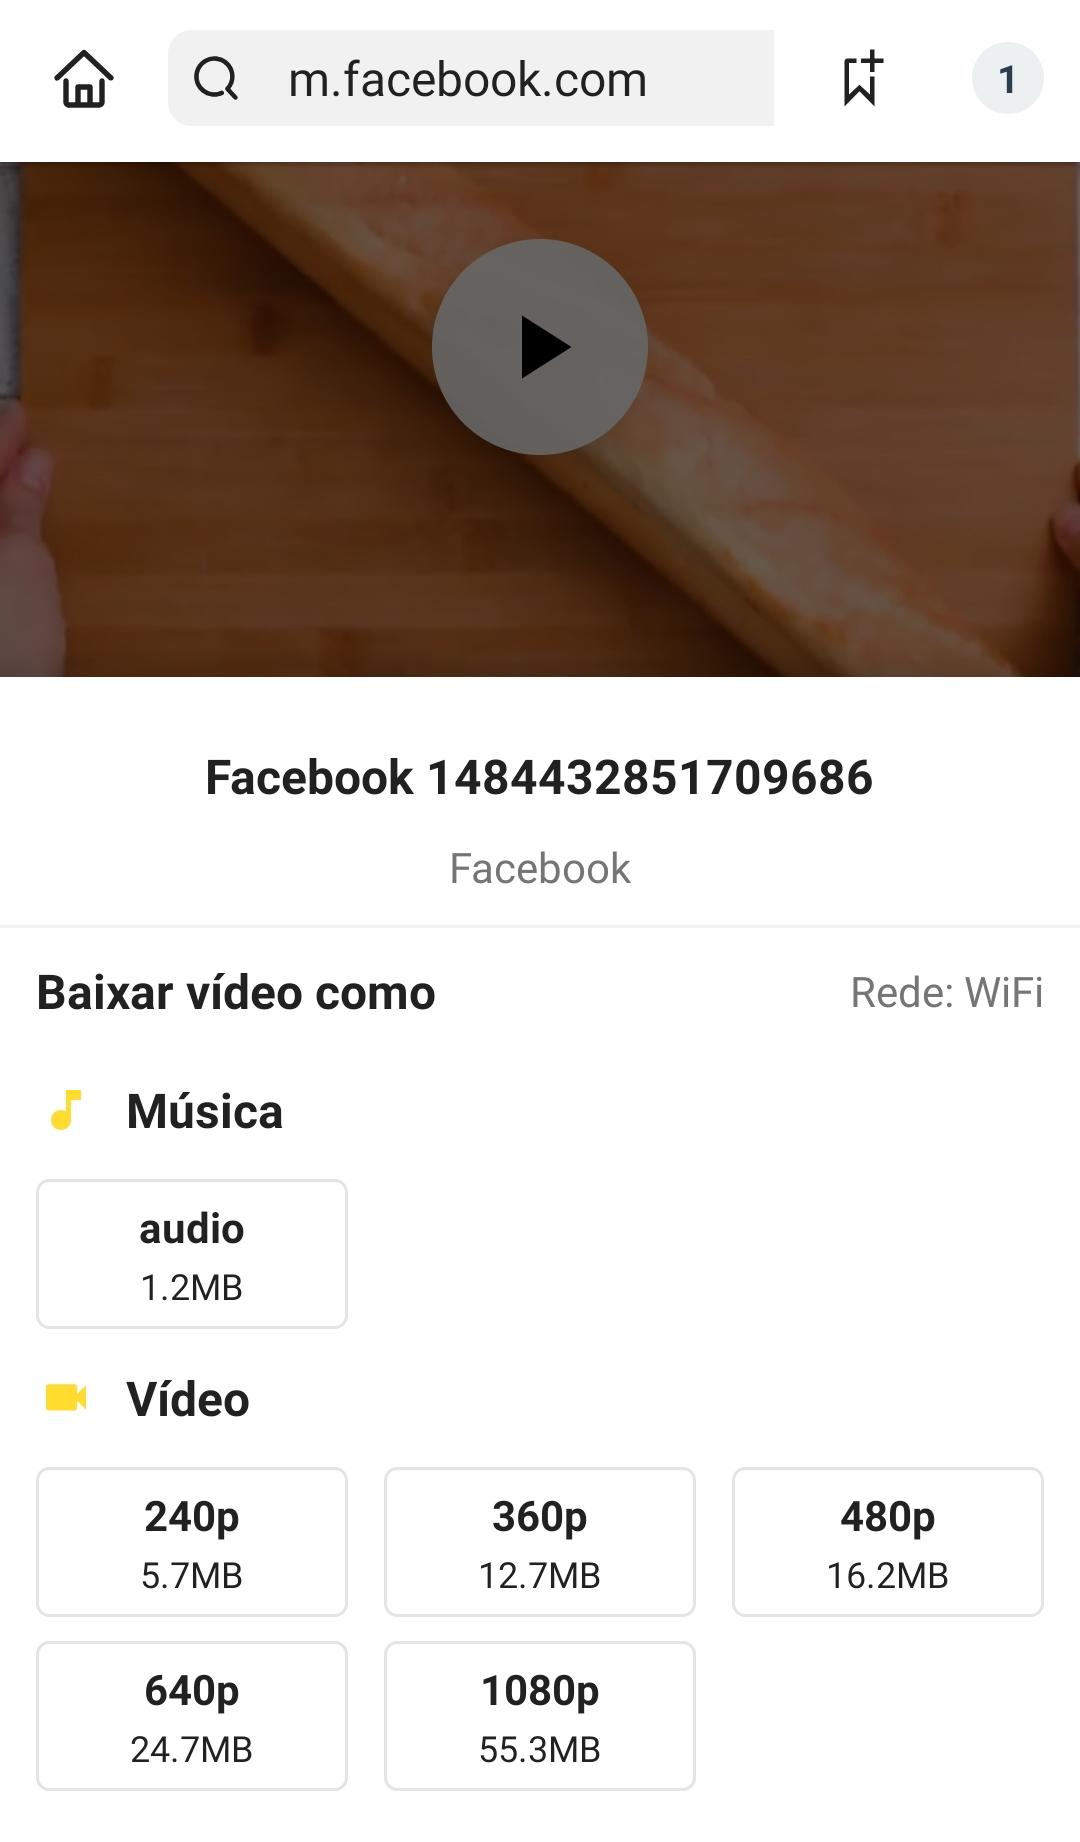 aplicativo para baixar vídeo no facebook